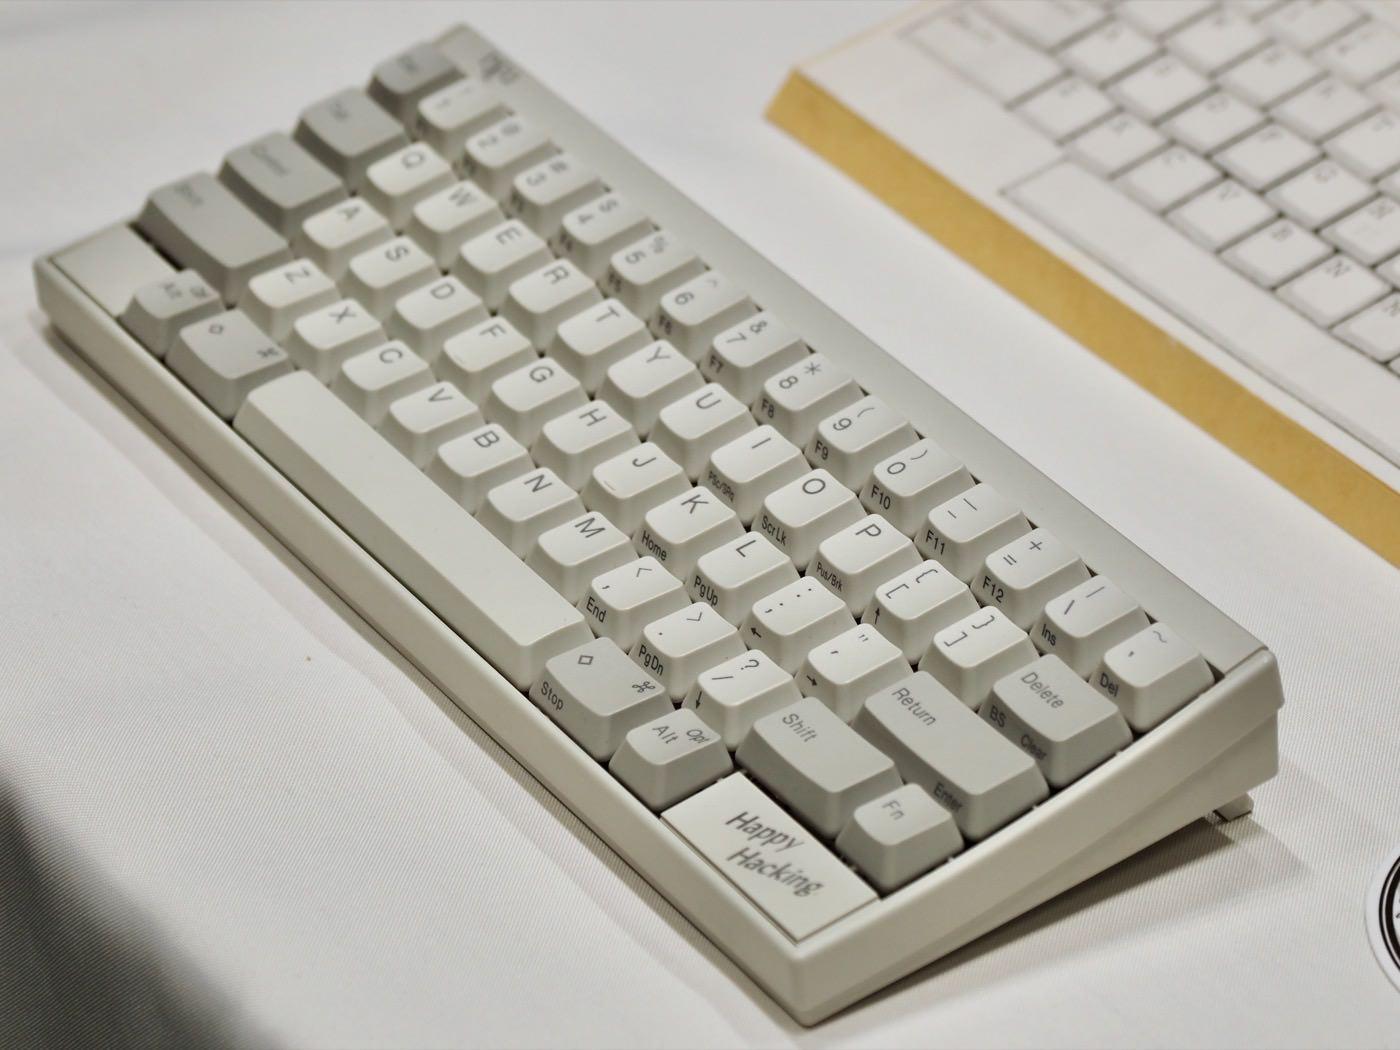 Happy hacking keyboard hybrid type s 00007